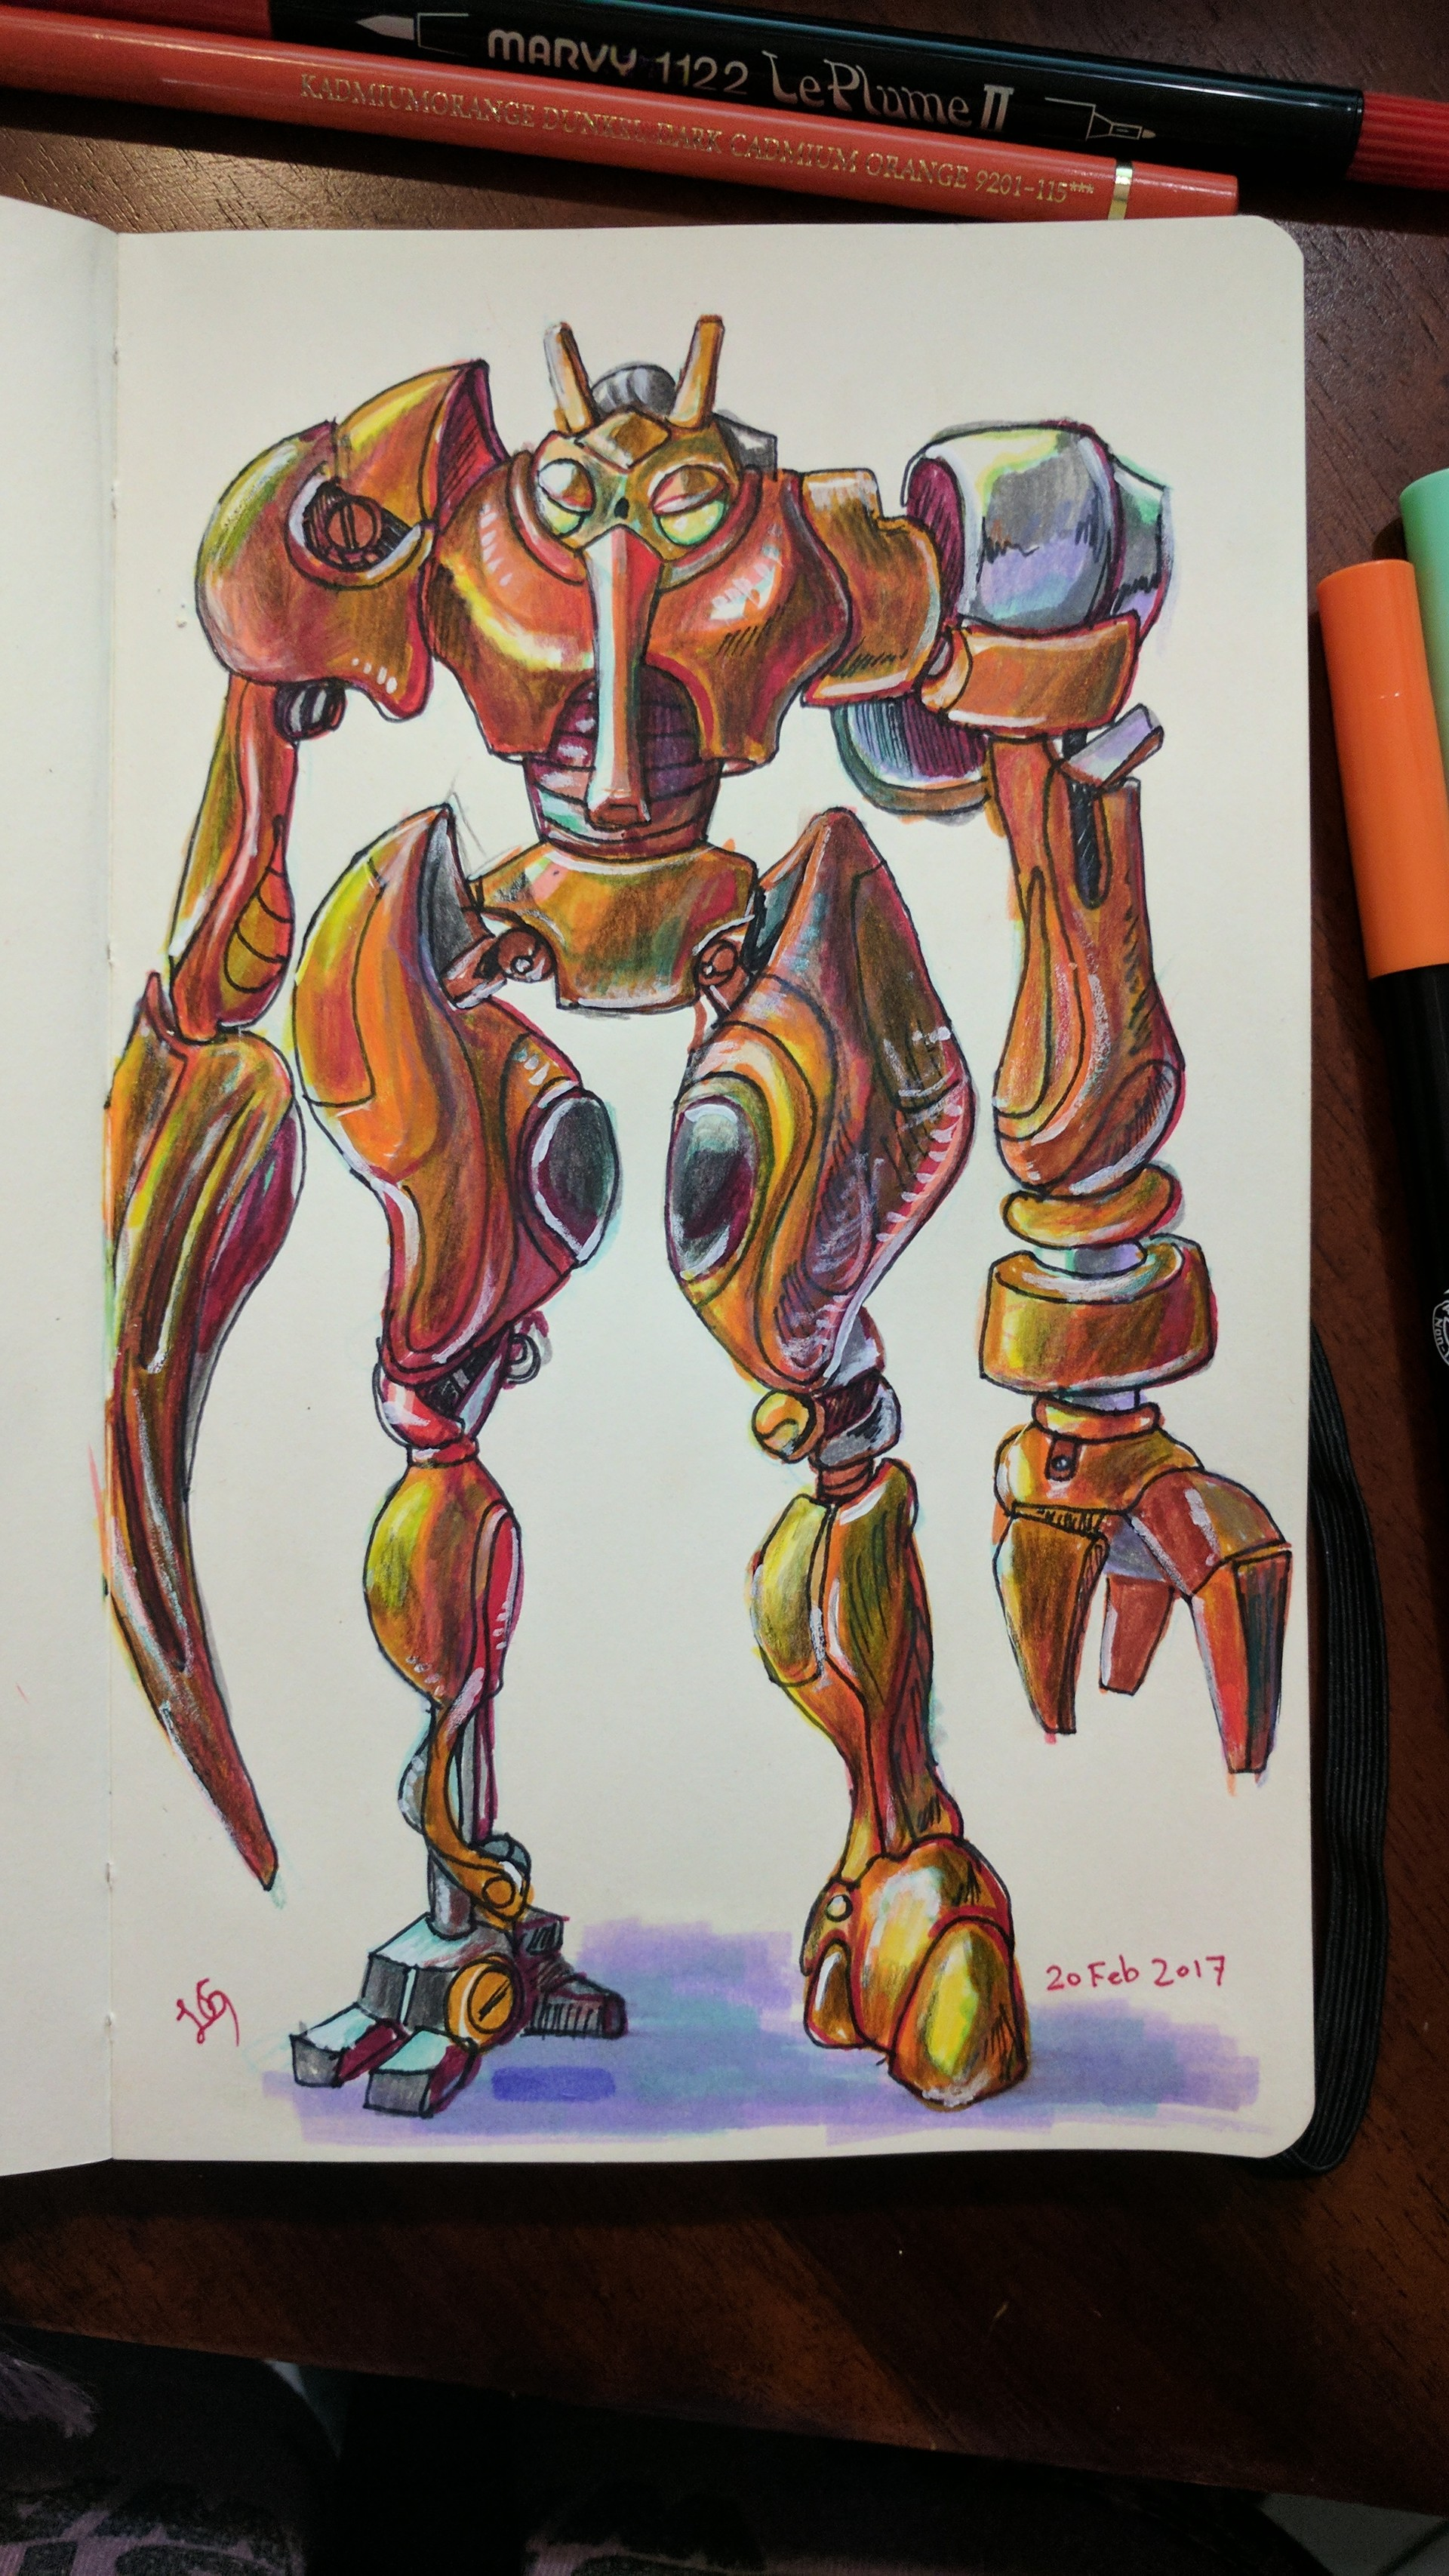 Precursor Robot